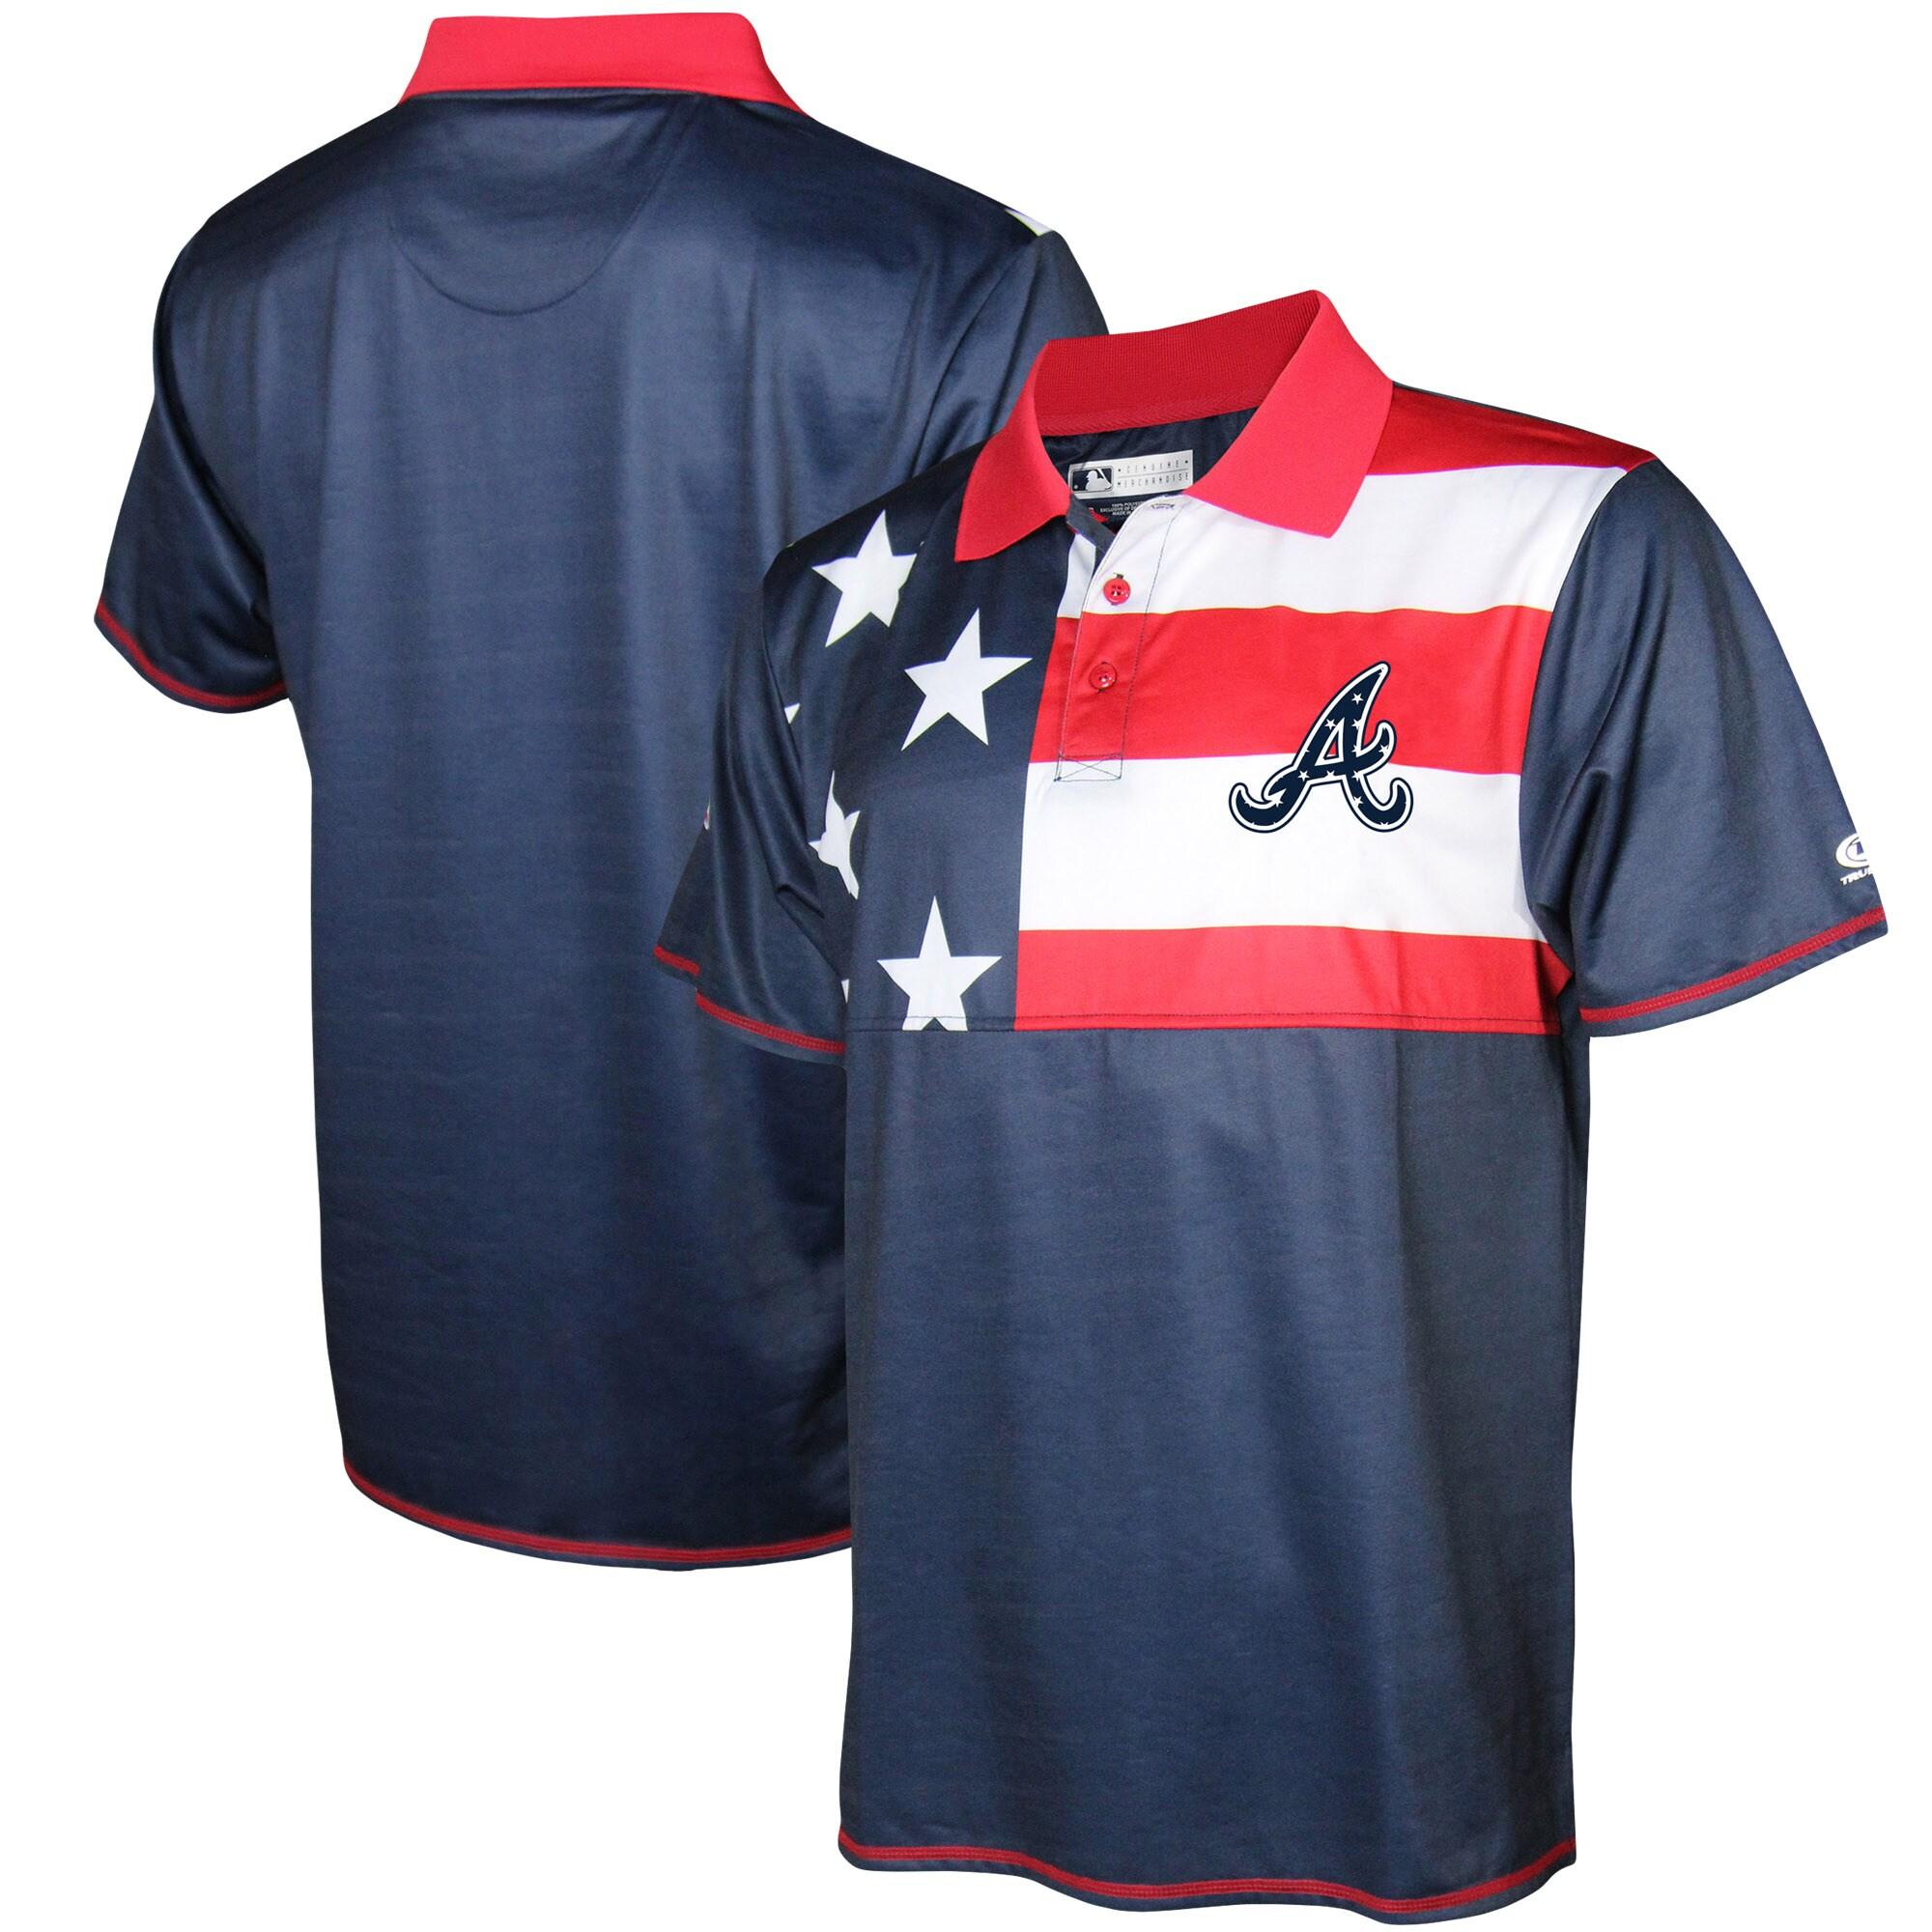 Atlanta Braves Stitches Stars & Stripe Polo - Navy/Red